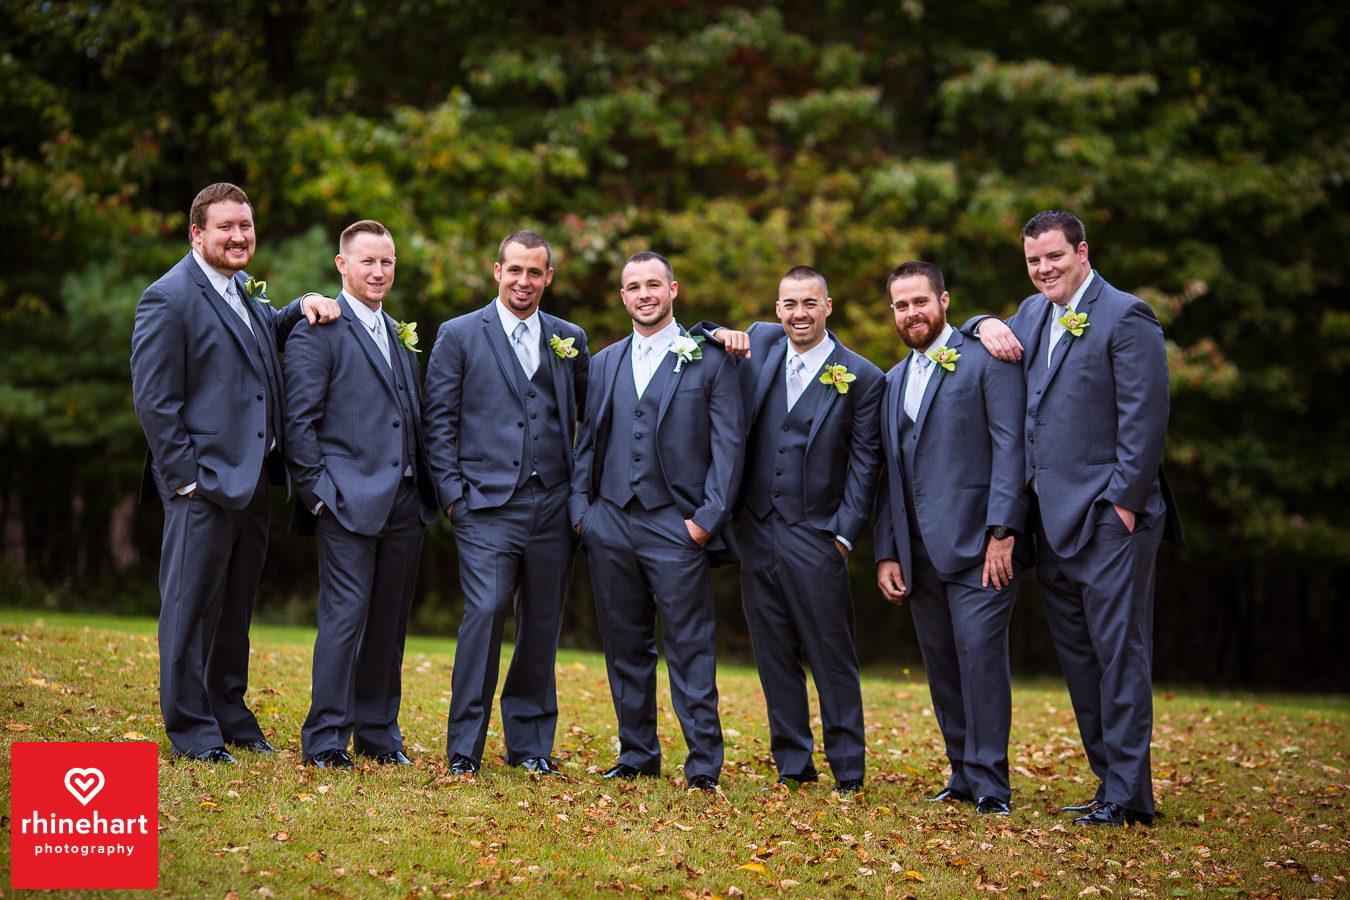 creative-unique-dc-area-wedding-photographers-7